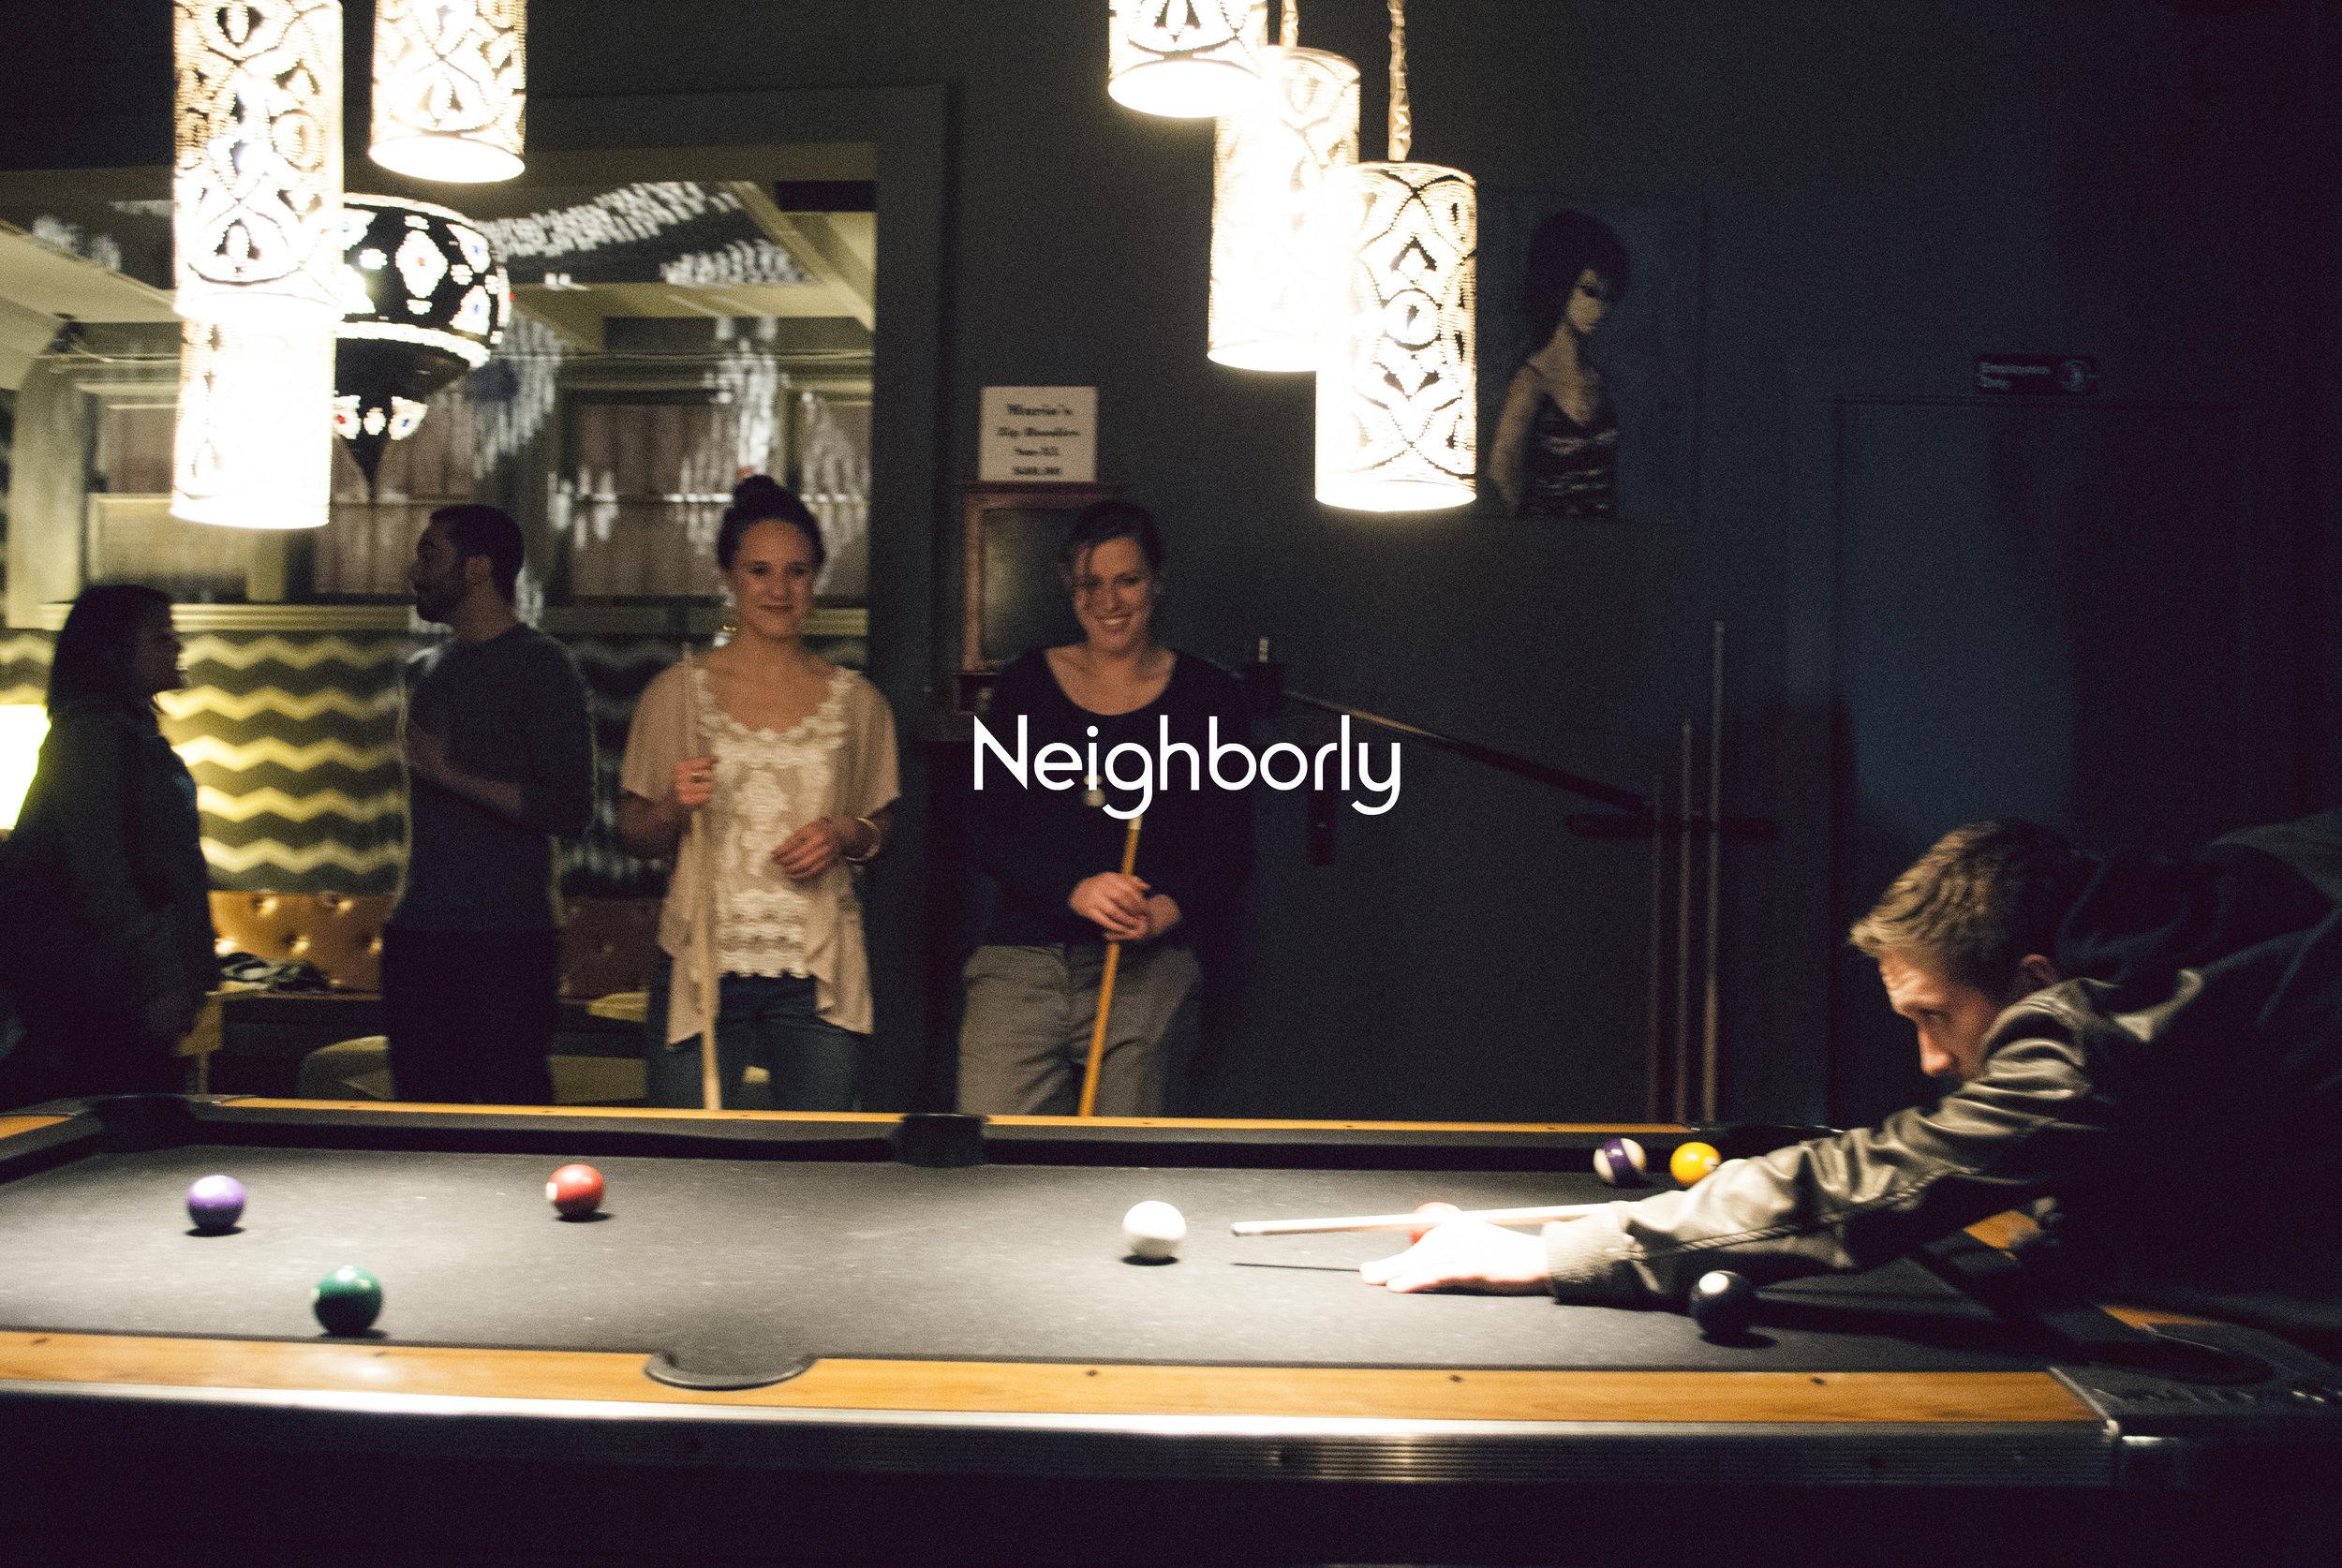 bar5 neighborly title copy.jpg